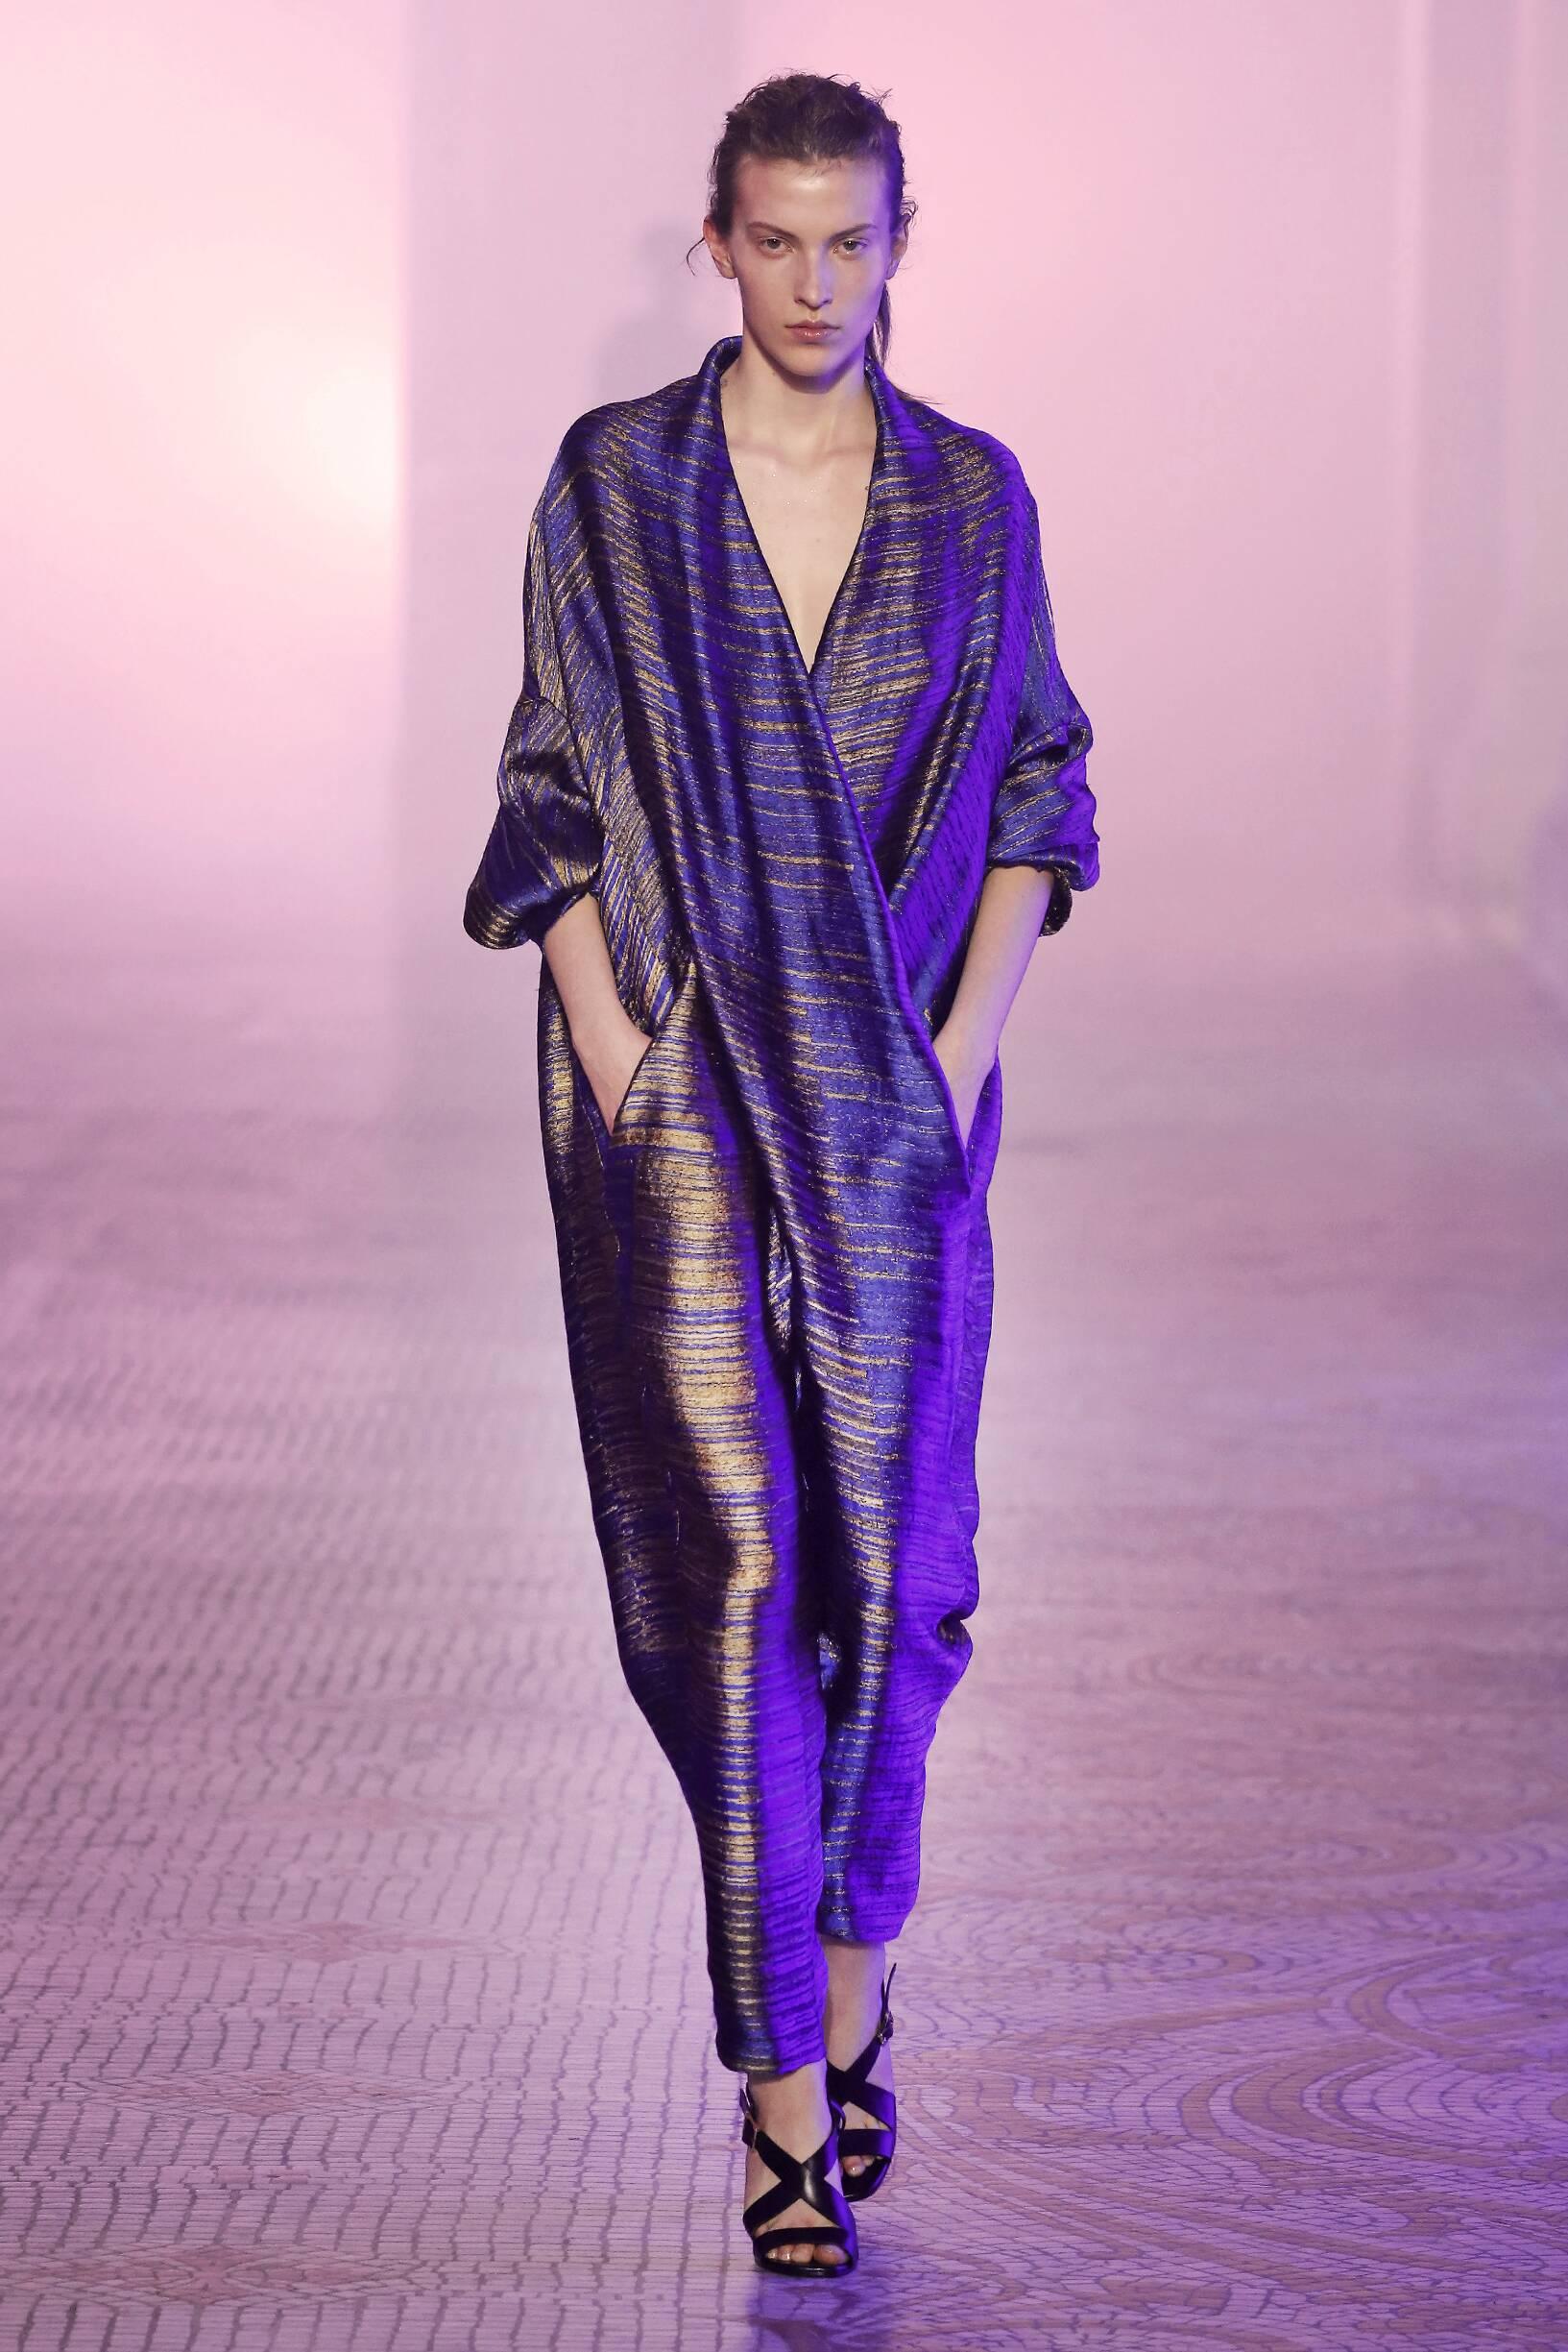 Catwalk Poiret Woman Fashion Show Winter 2018